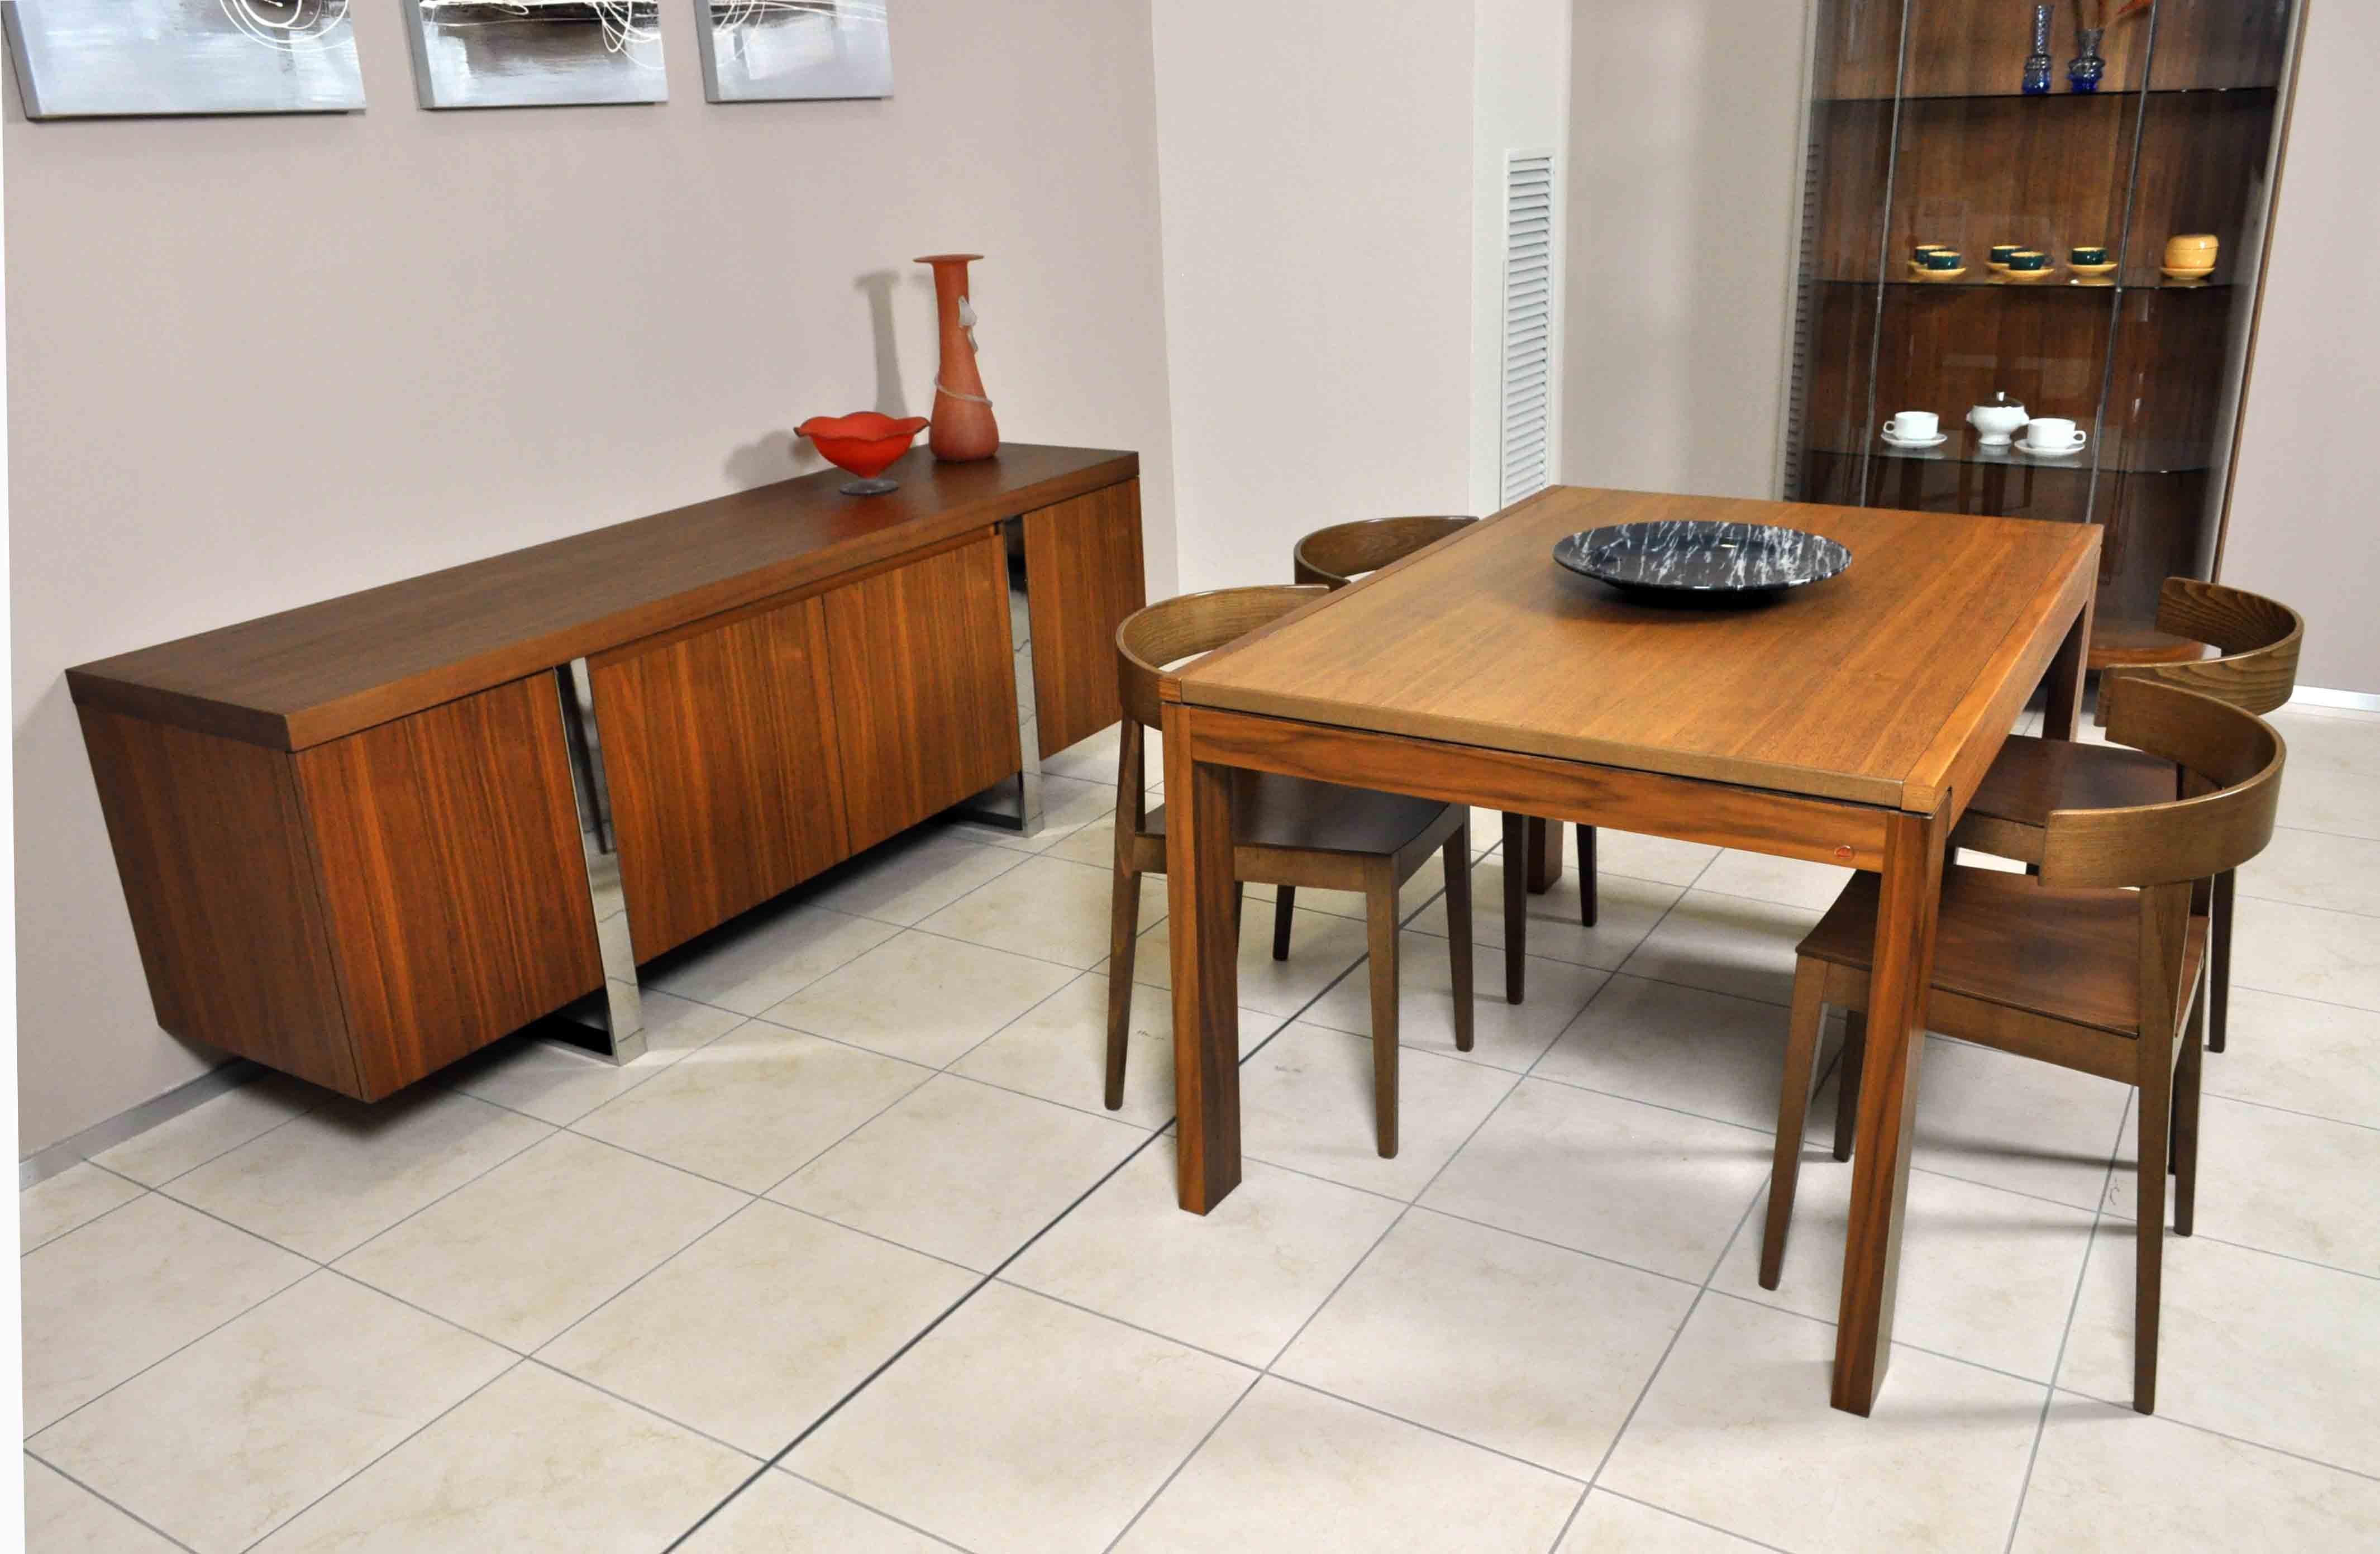 Stunning Calligaris Mobili Soggiorno Photos - Home Design ...